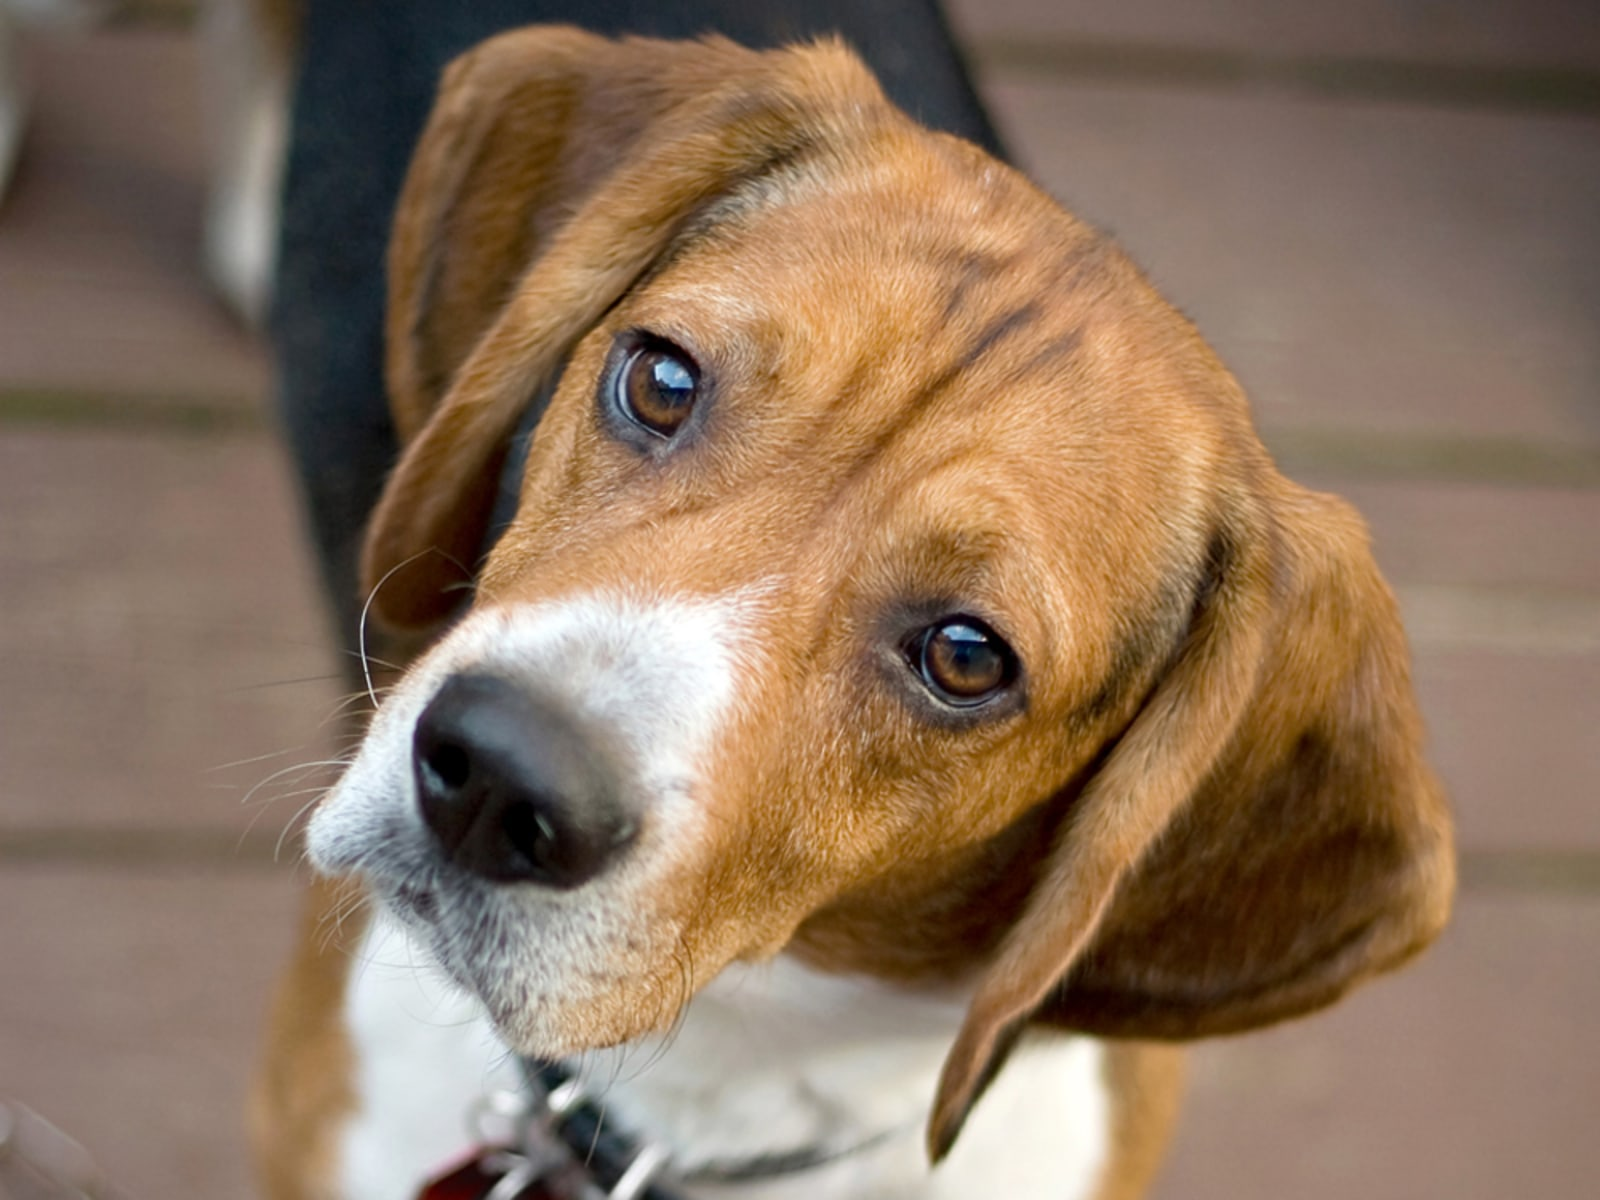 Image: A curious beagle